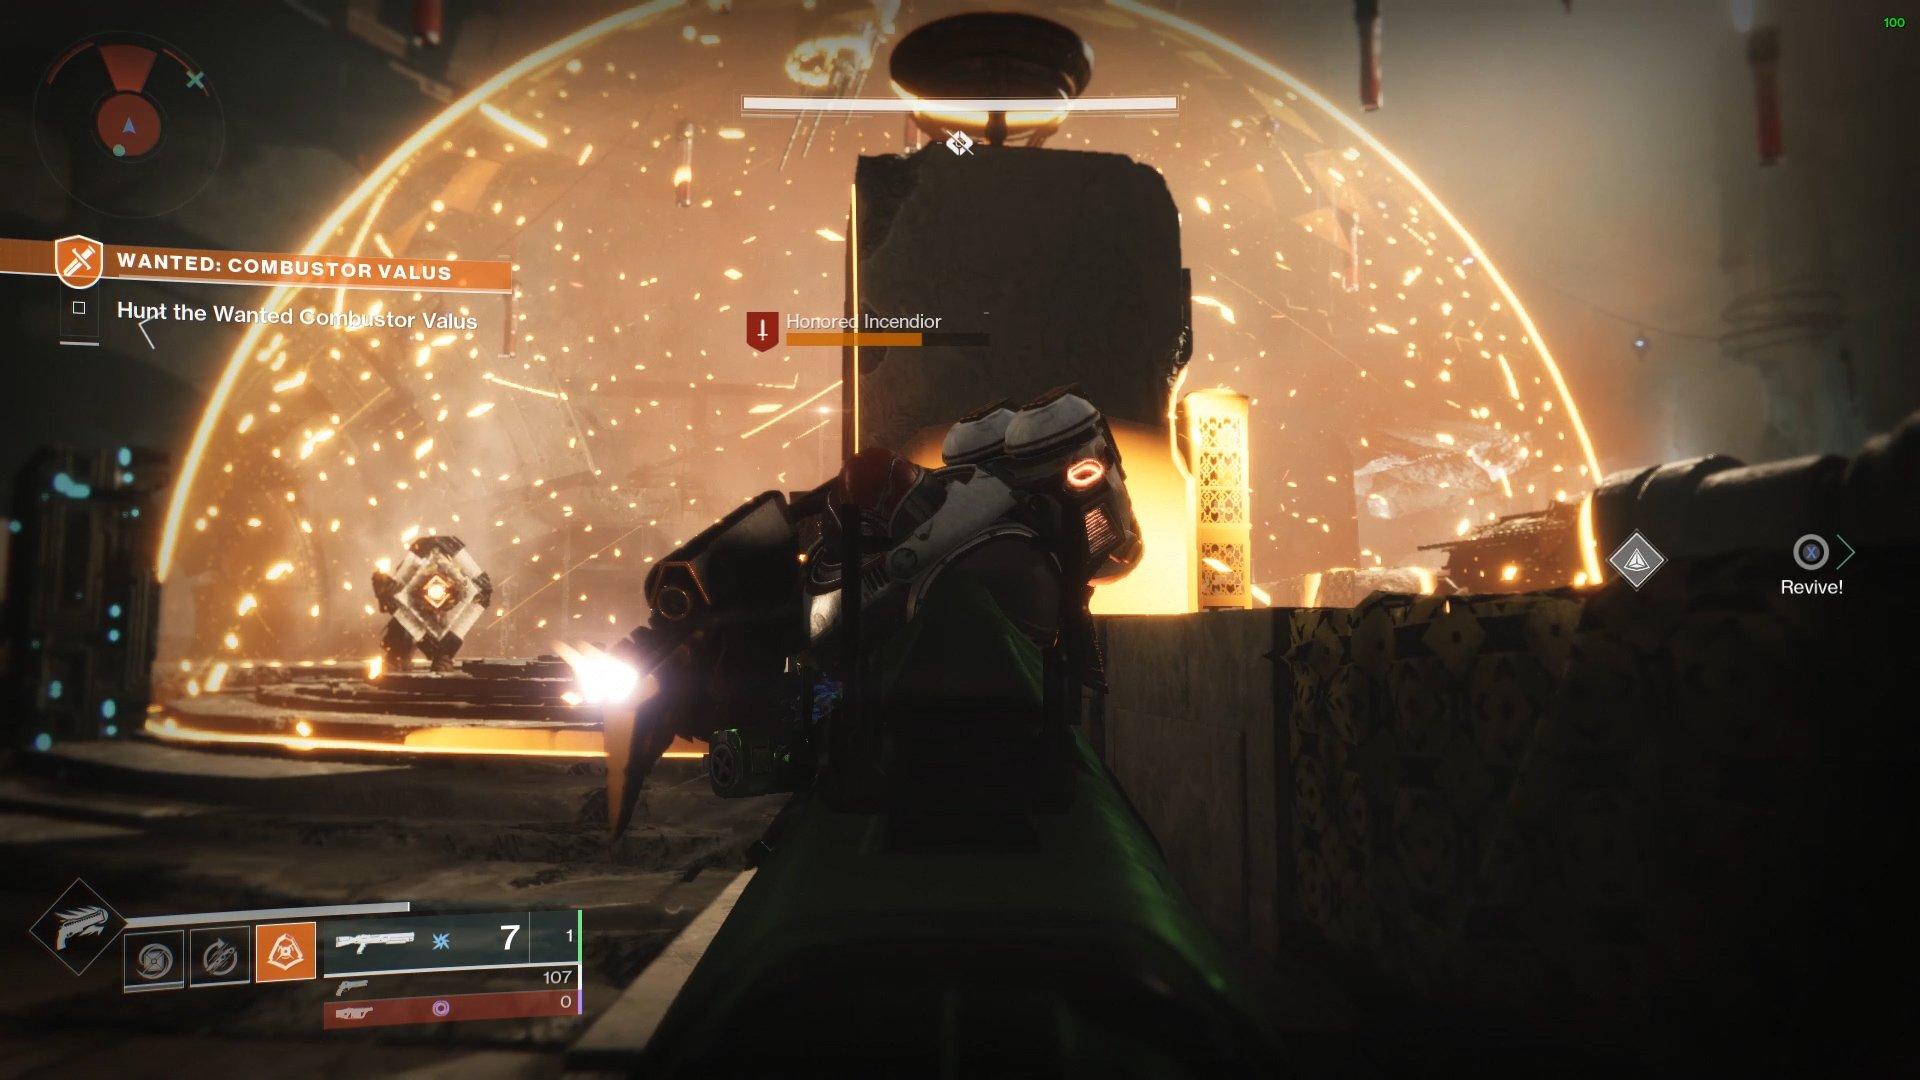 Destiny 2 Combustor Valus